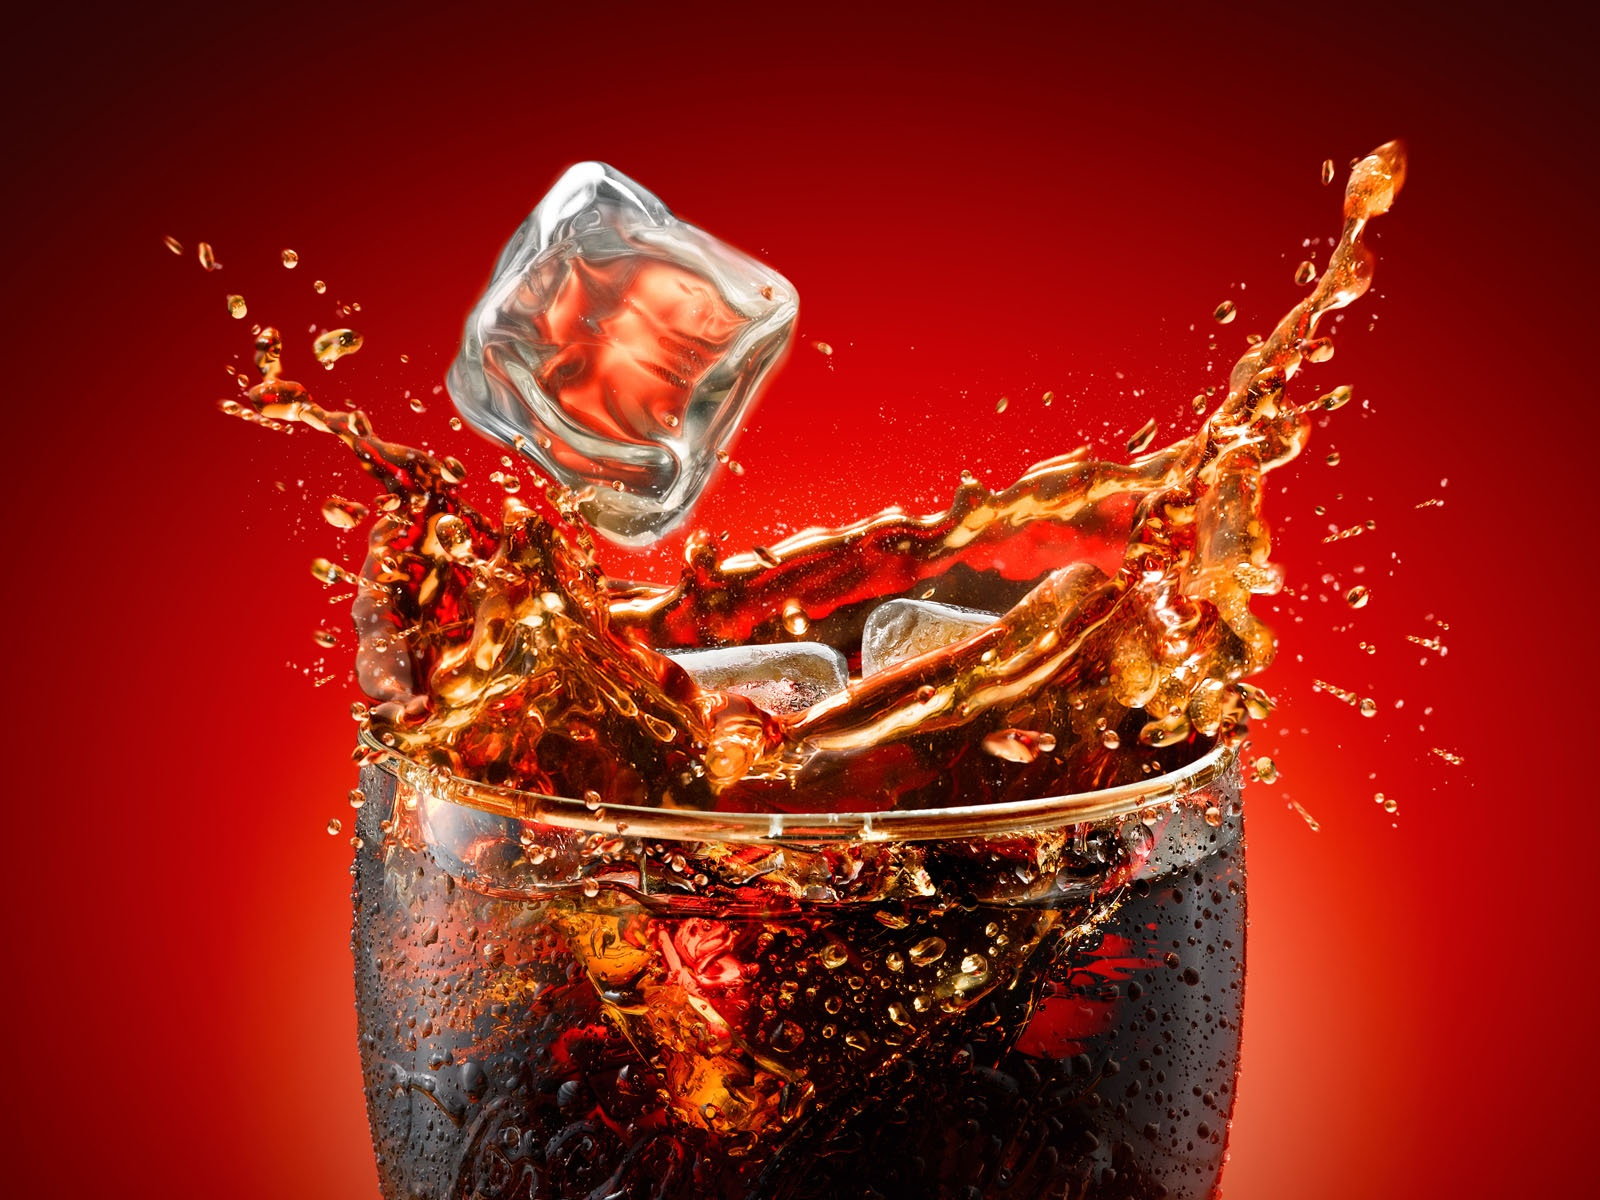 Ice-splash-in-a-Coca-Cola-cup-wallpaper_4256